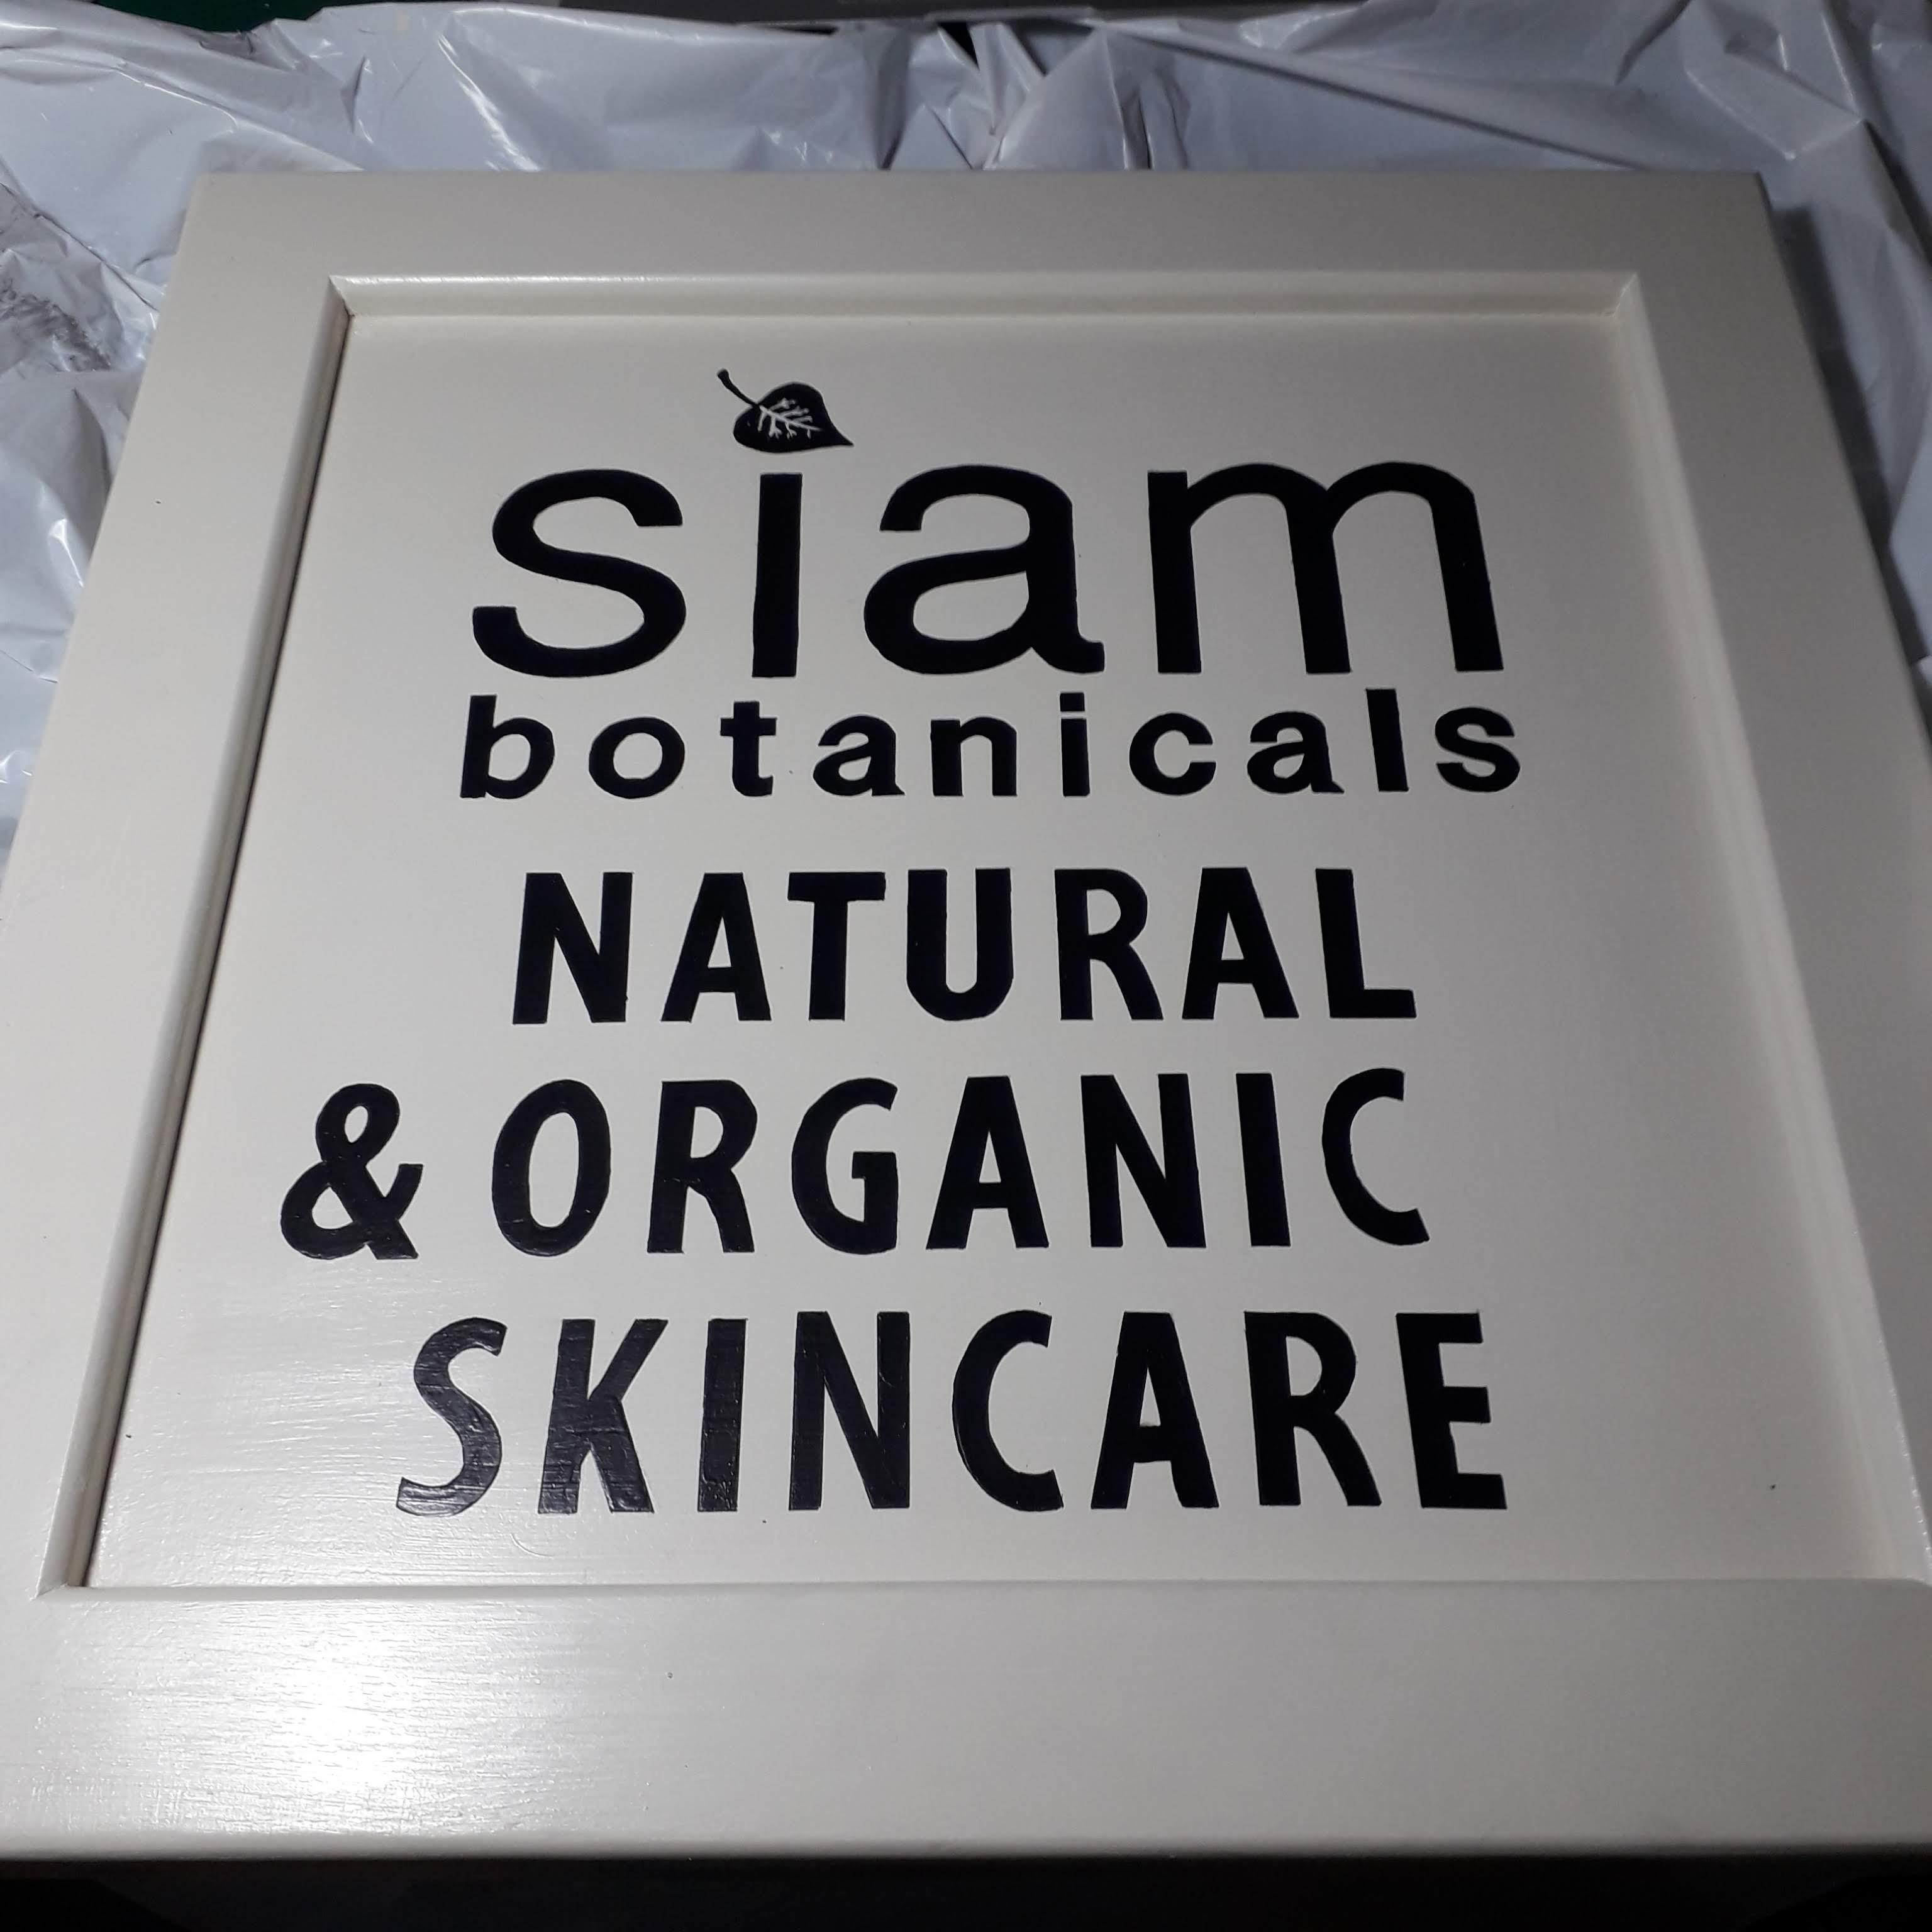 Siam shop sign